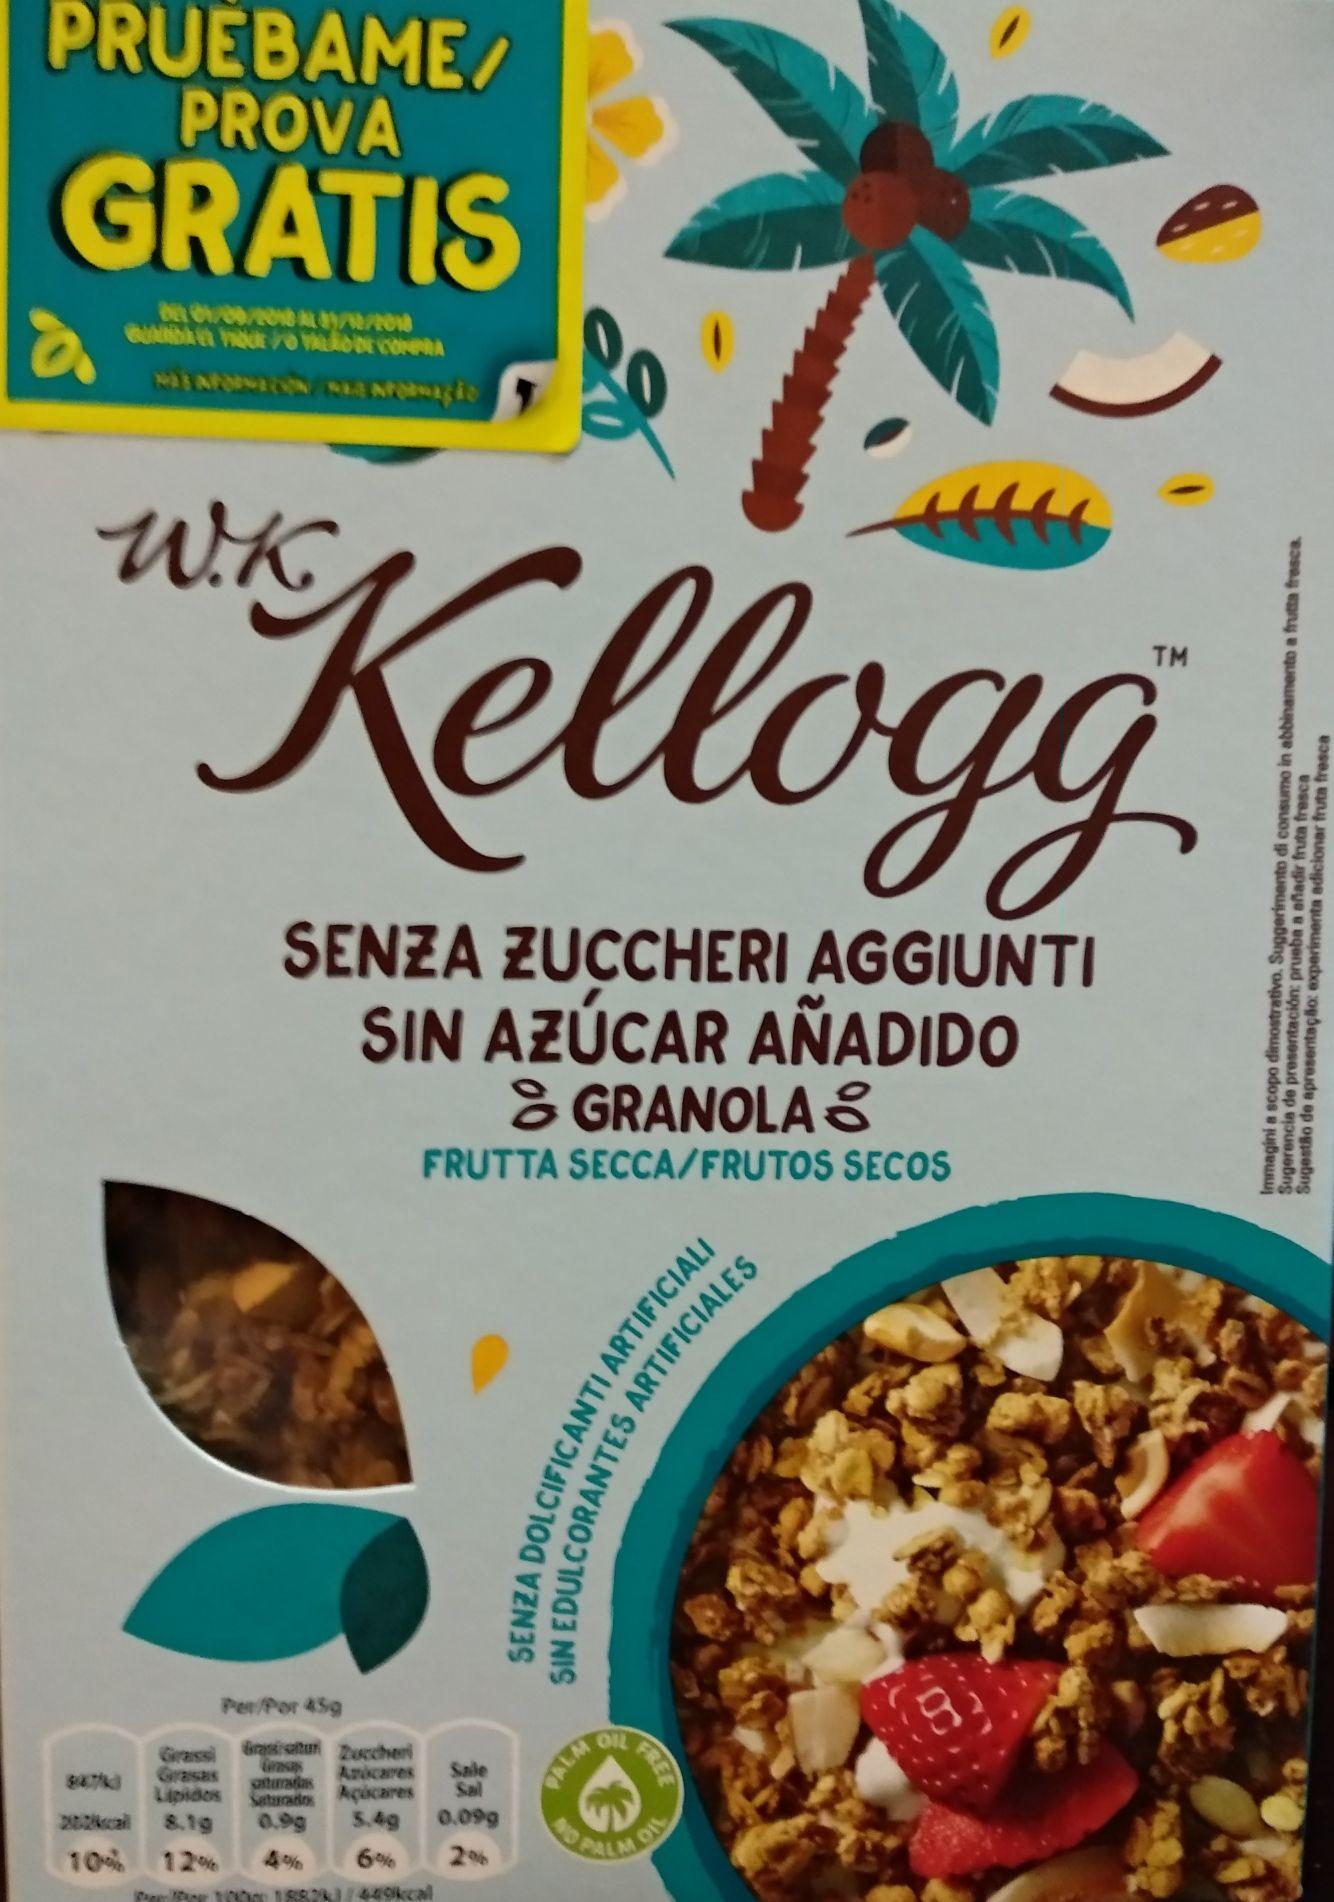 Cereales WK Kellogg Granola GRATIS REEMBOLSO